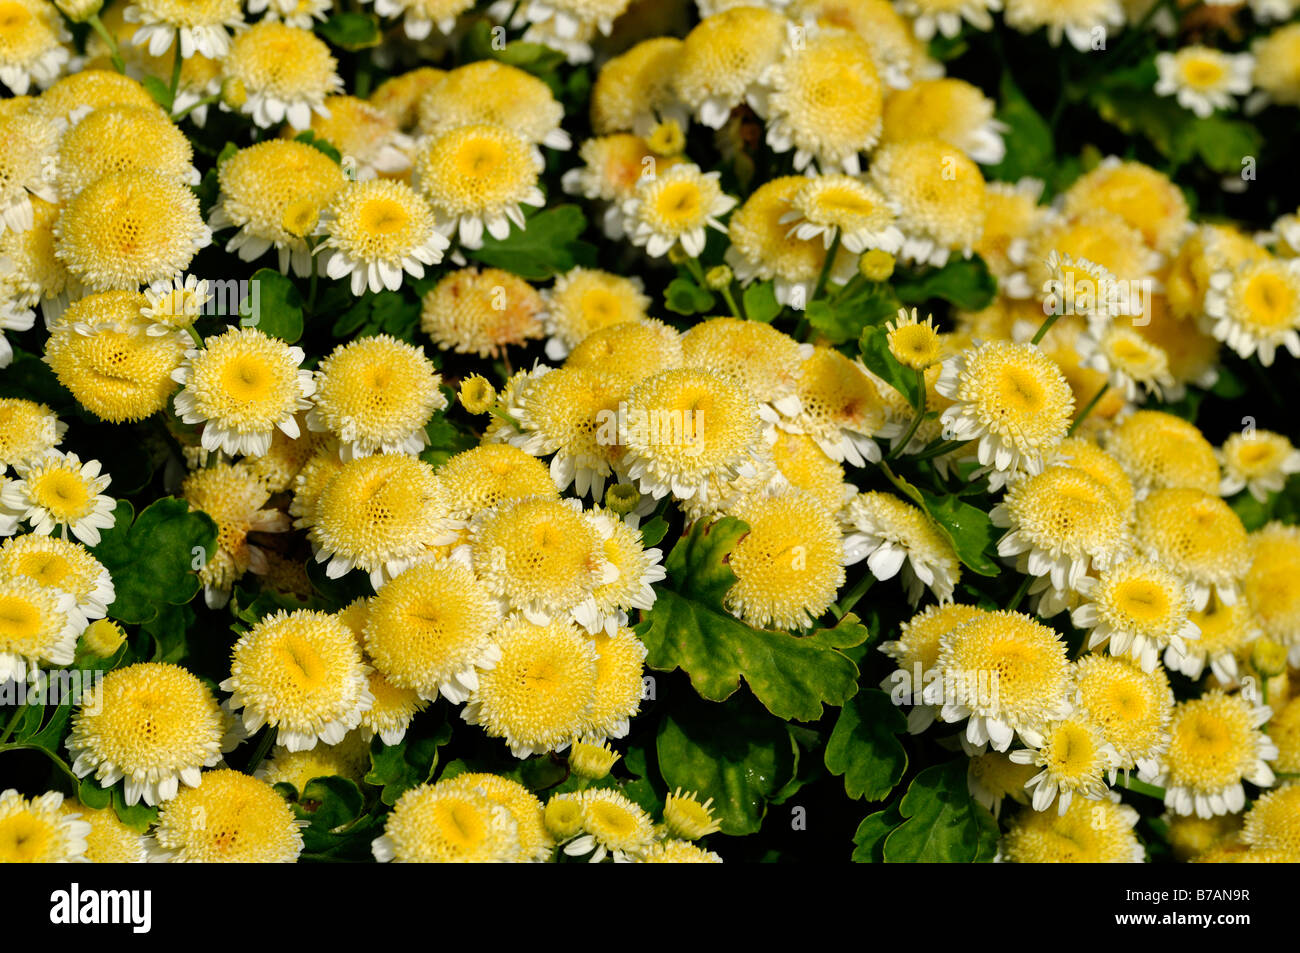 chrysanthemum morifolium ramat butterball yellow flowers daisy, Natural flower